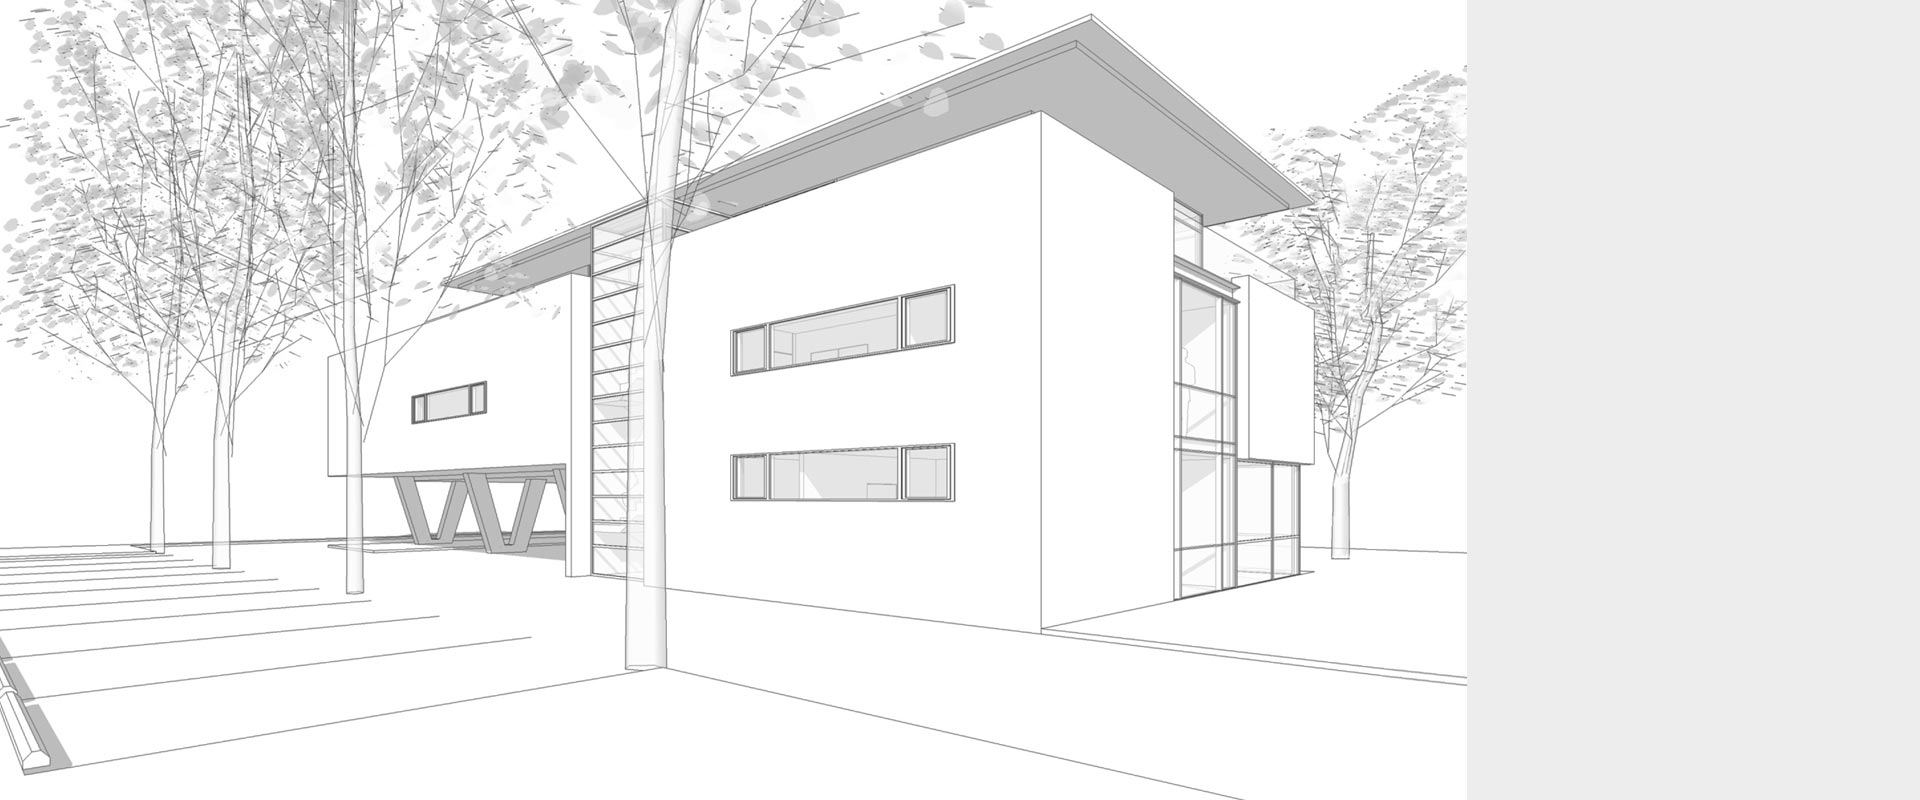 architekturbuero_henning_musahl_waldshut_zahnklinik03